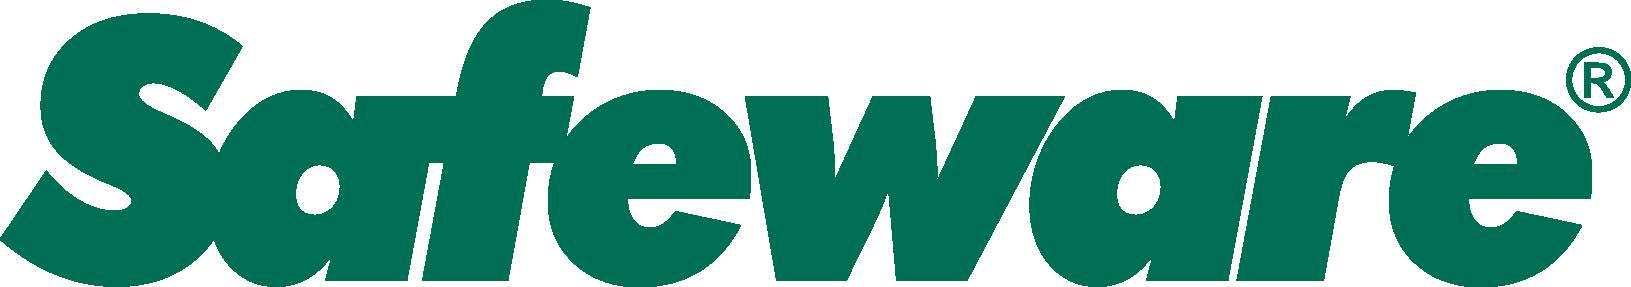 Safeware hi res logo.jpg